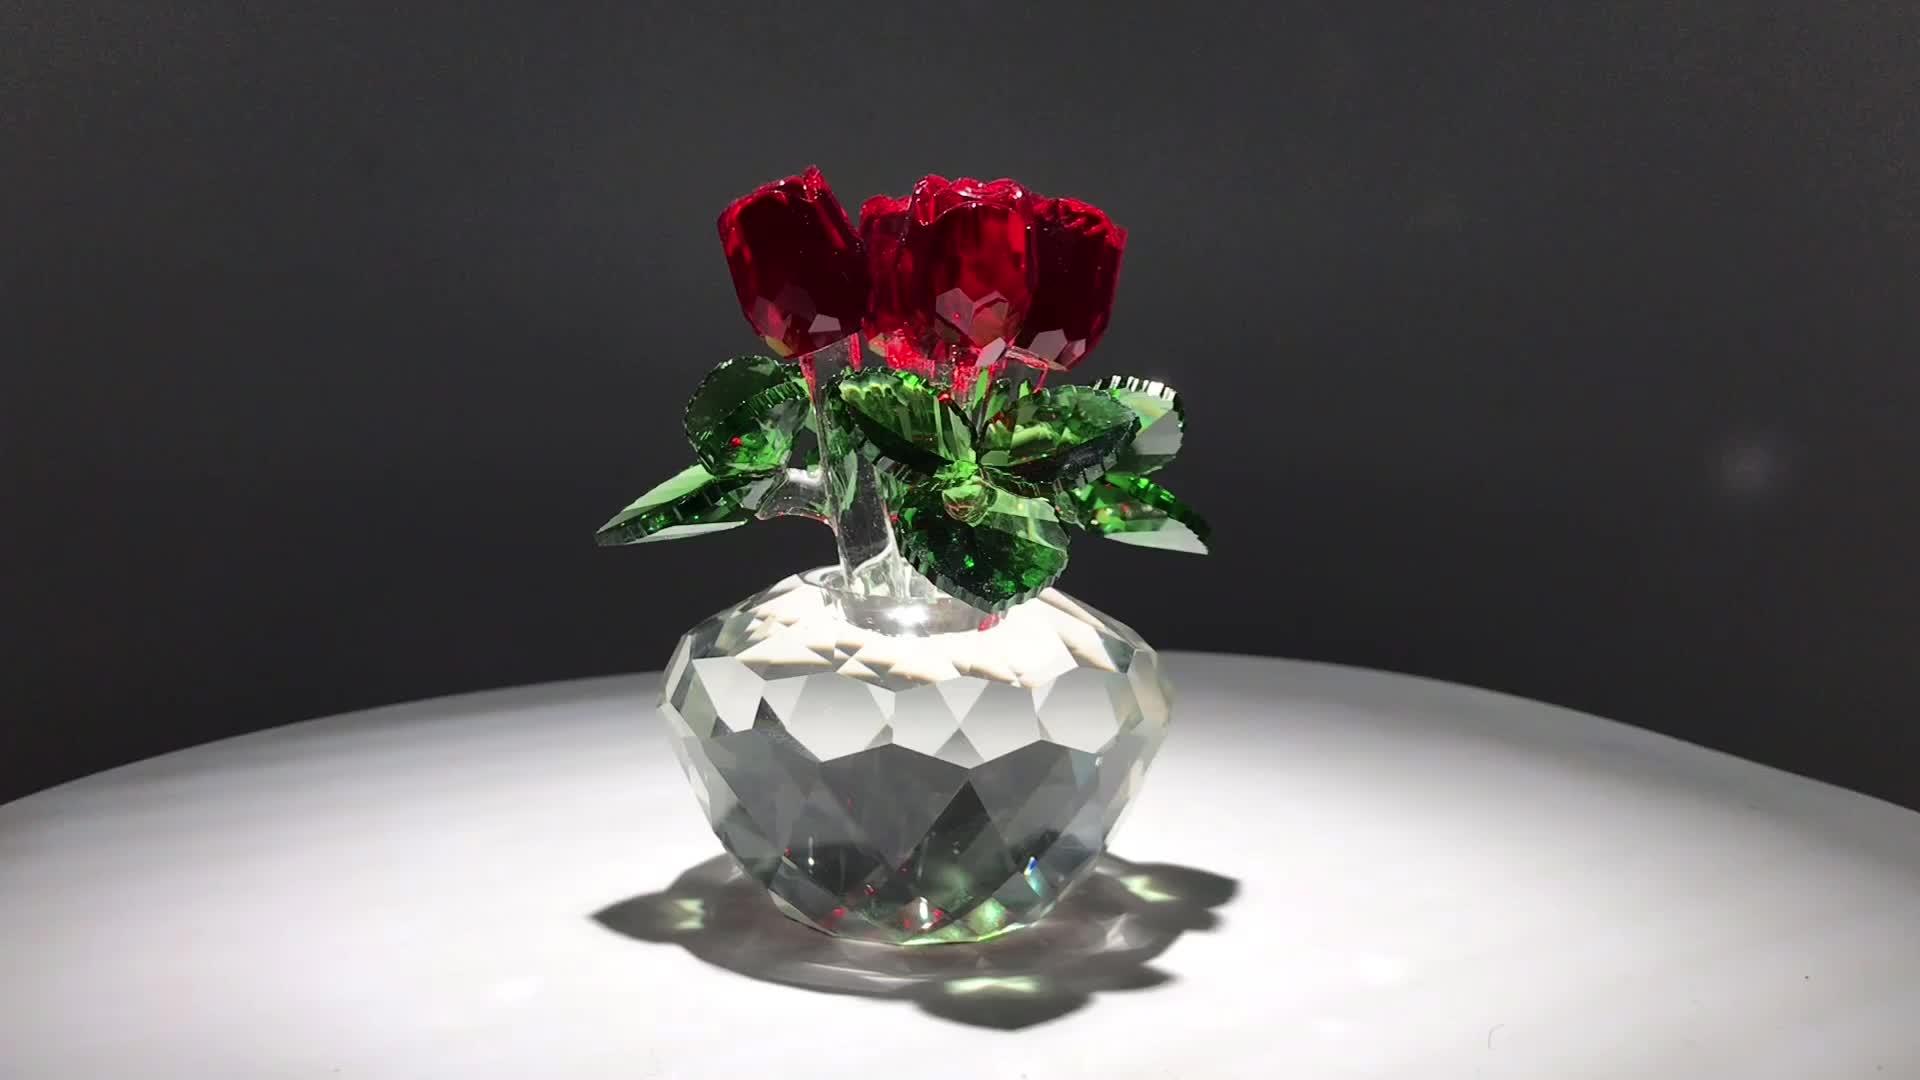 wholesale top k9 crystal rose flower home decor wedding gift Dreams Ornament souvenir valentine gift rose flower paperweight